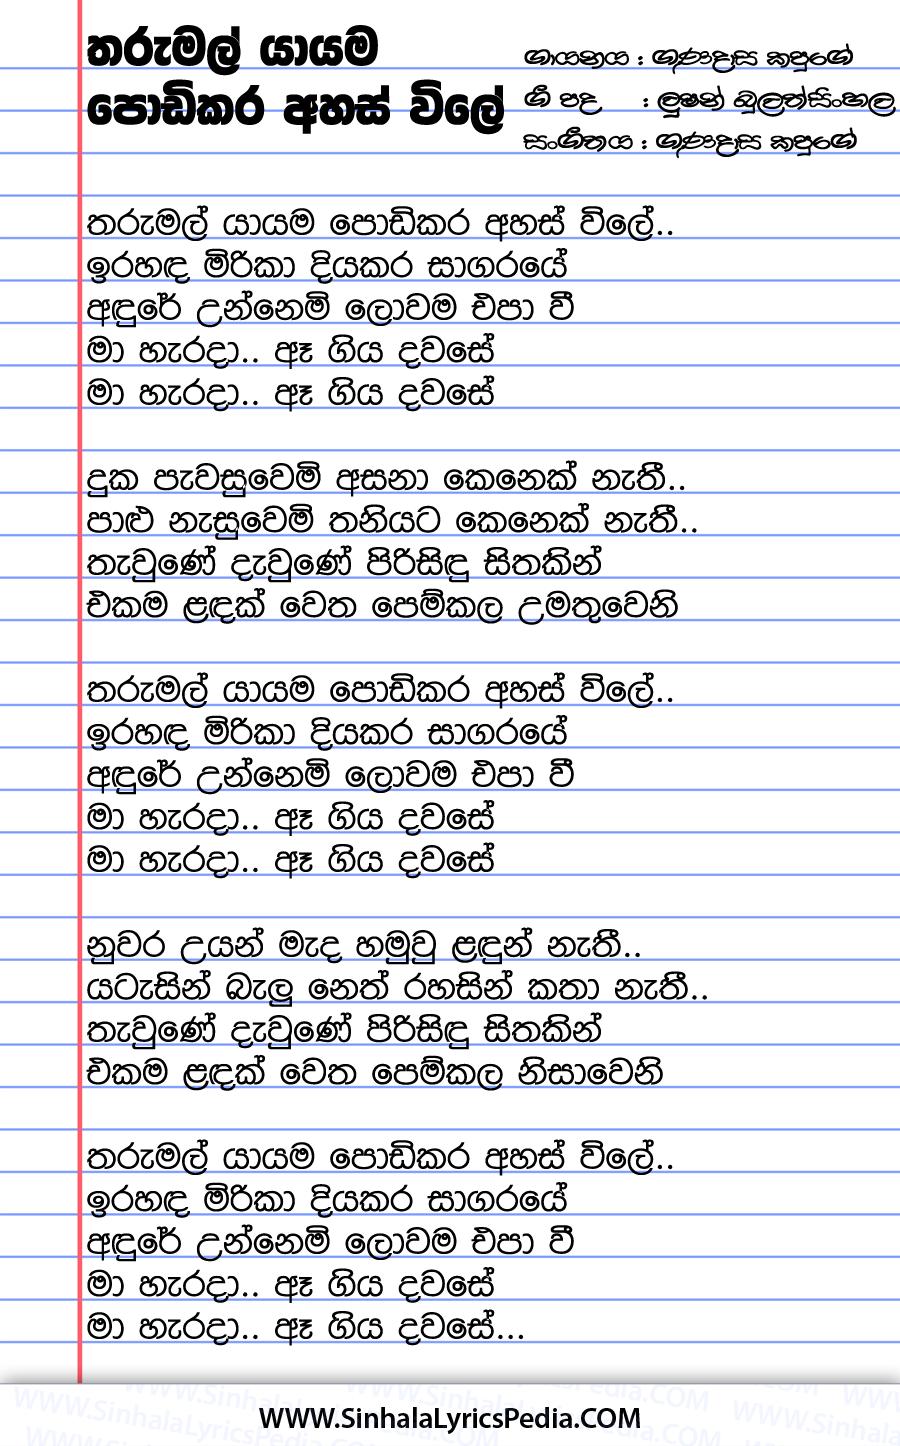 Tharu Mal Yayama Podi Kara Ahas Wile Song Lyrics